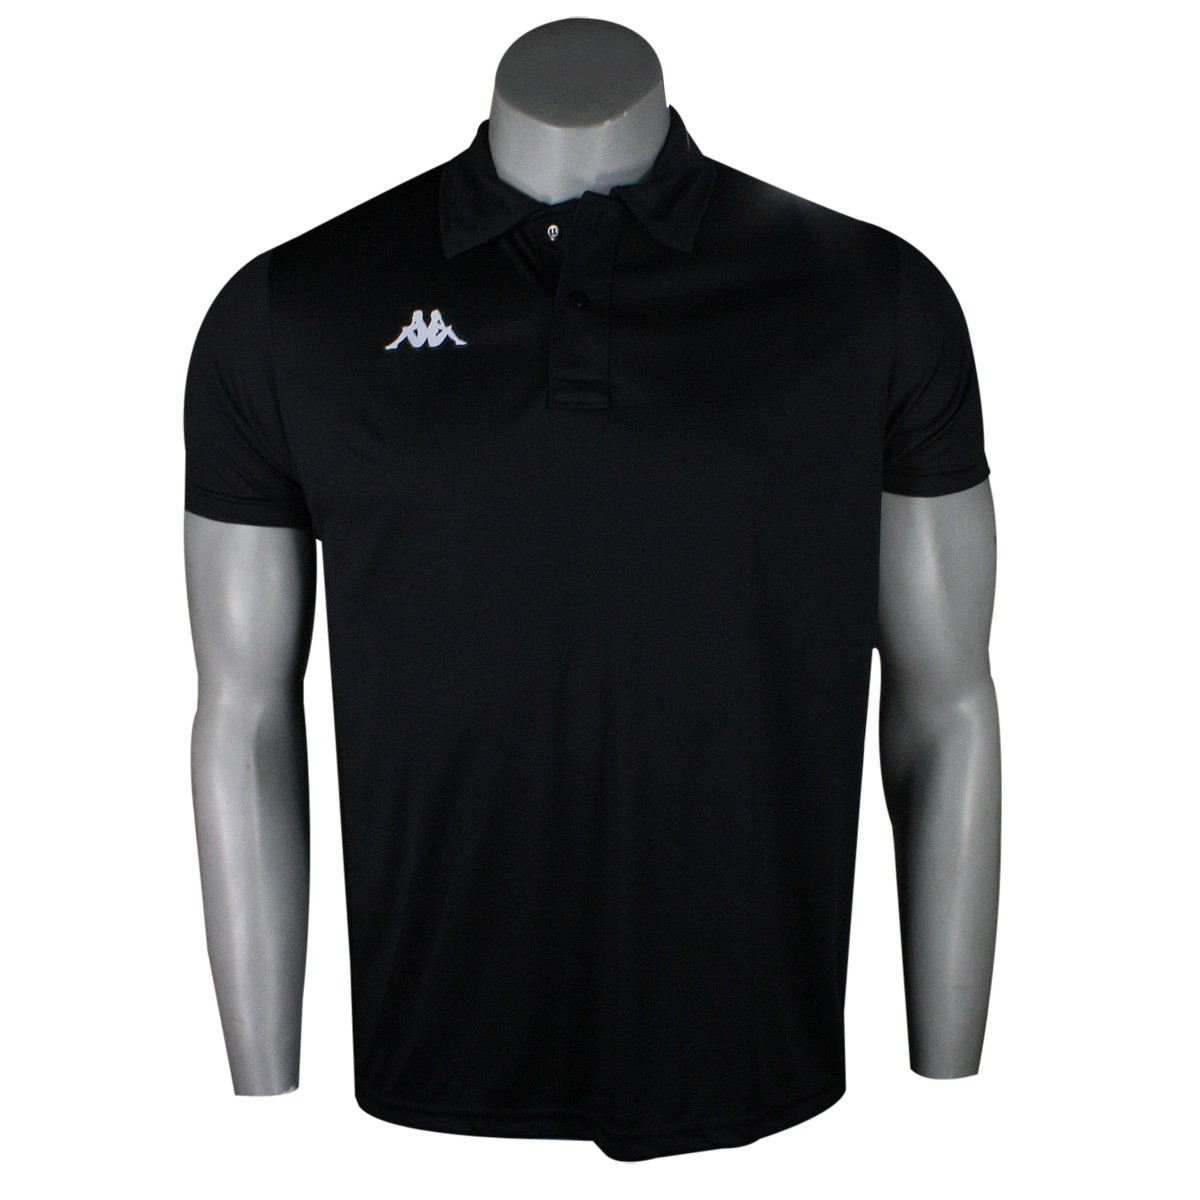 f5d26d902597a Camiseta Kappa Polo Masculina Sewill 302UXT0 N001 - Preto - Botas ...